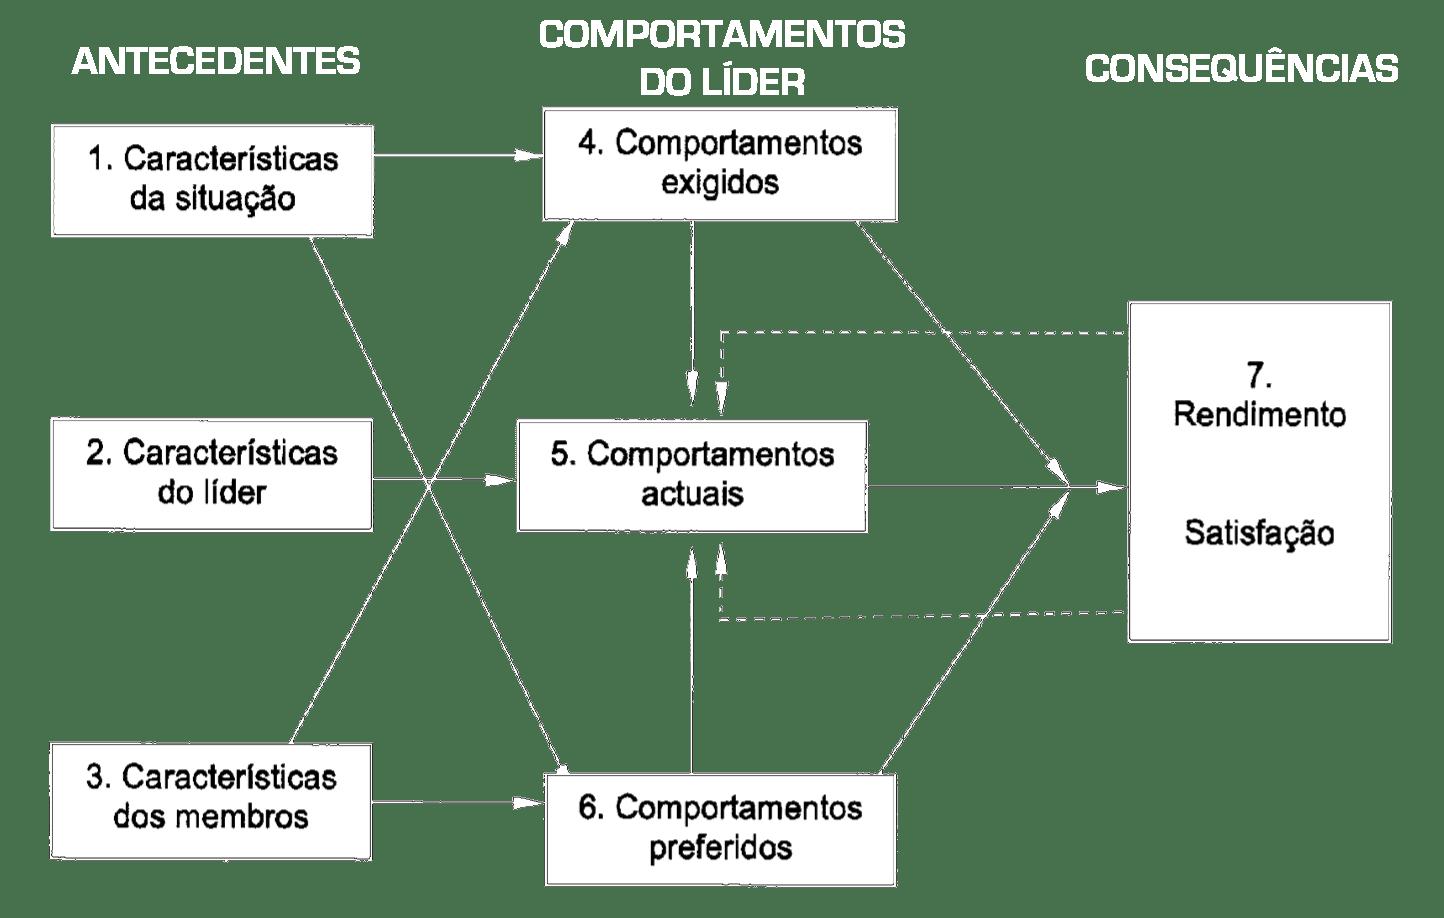 Modelo Multidimensional de Liderança no Desporto proposto por Chelladurai, adaptado por (Ferreira, 2008).